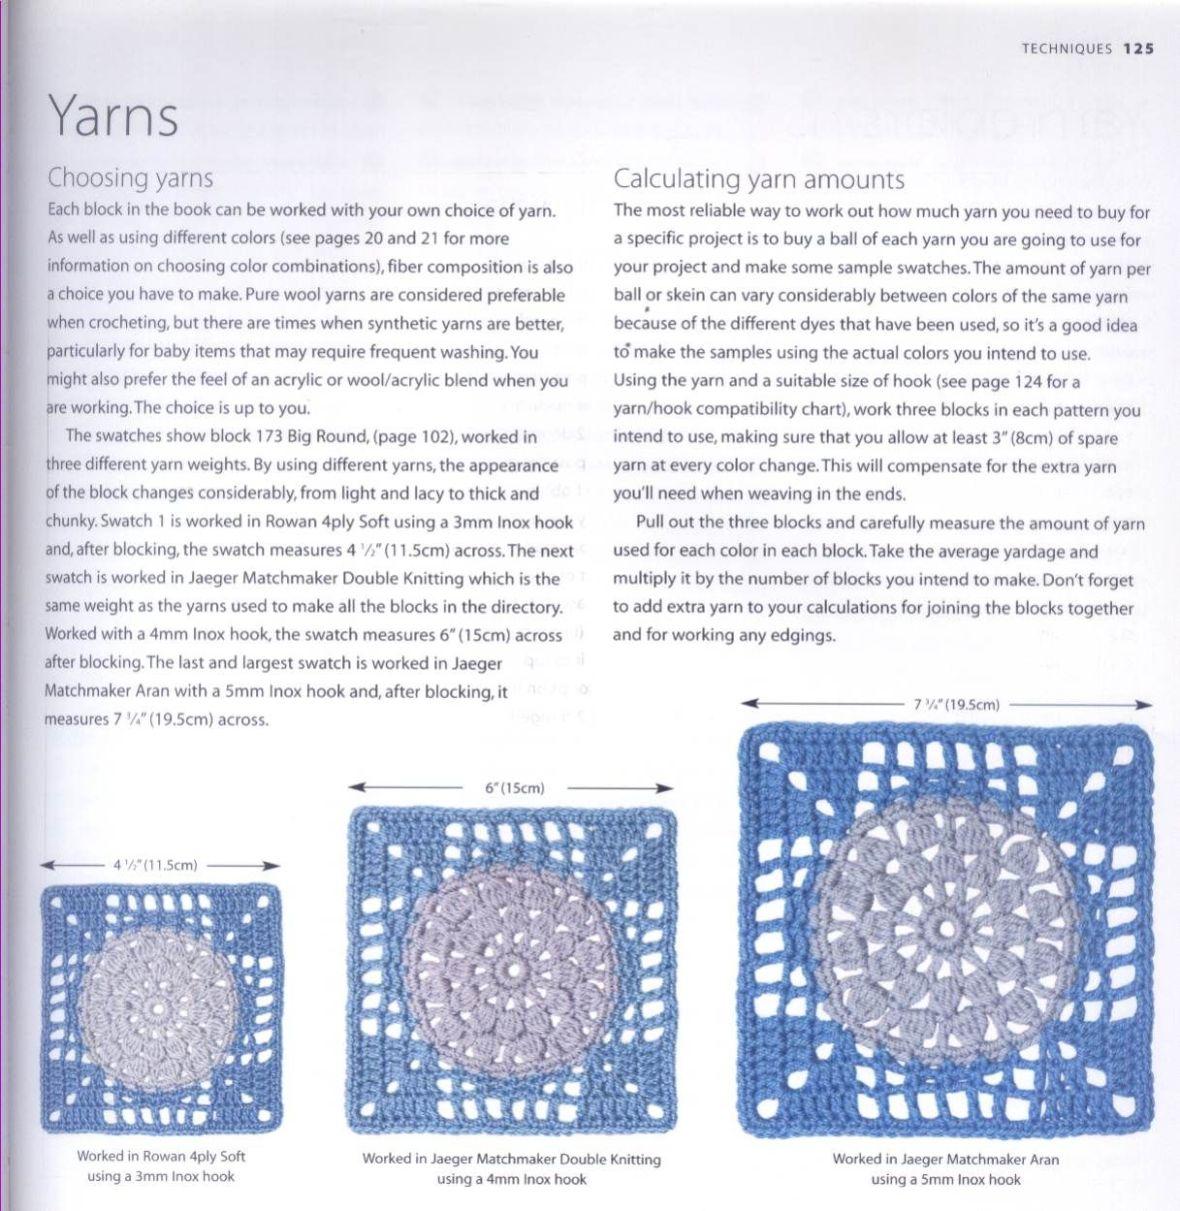 200 Crocheted Blocks for blankets, throws & Afghans 125